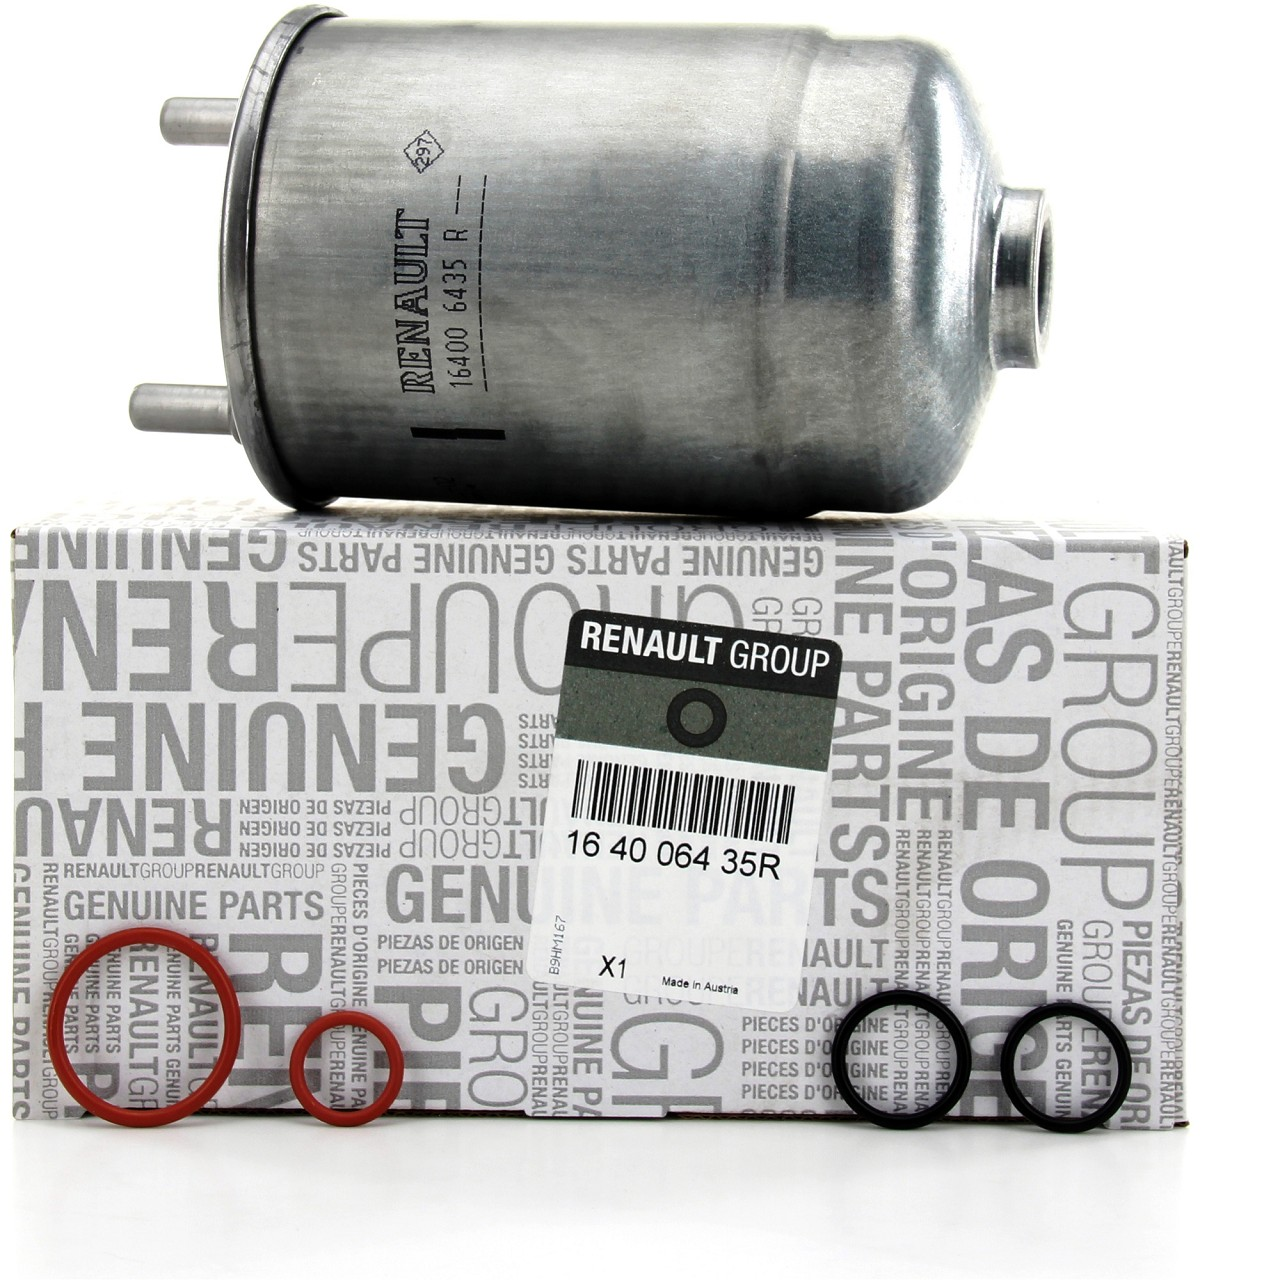 ORIGINAL Renault Kraftstofffilter Dieselfilter Megane Scenic 1.5dCi 164006435R